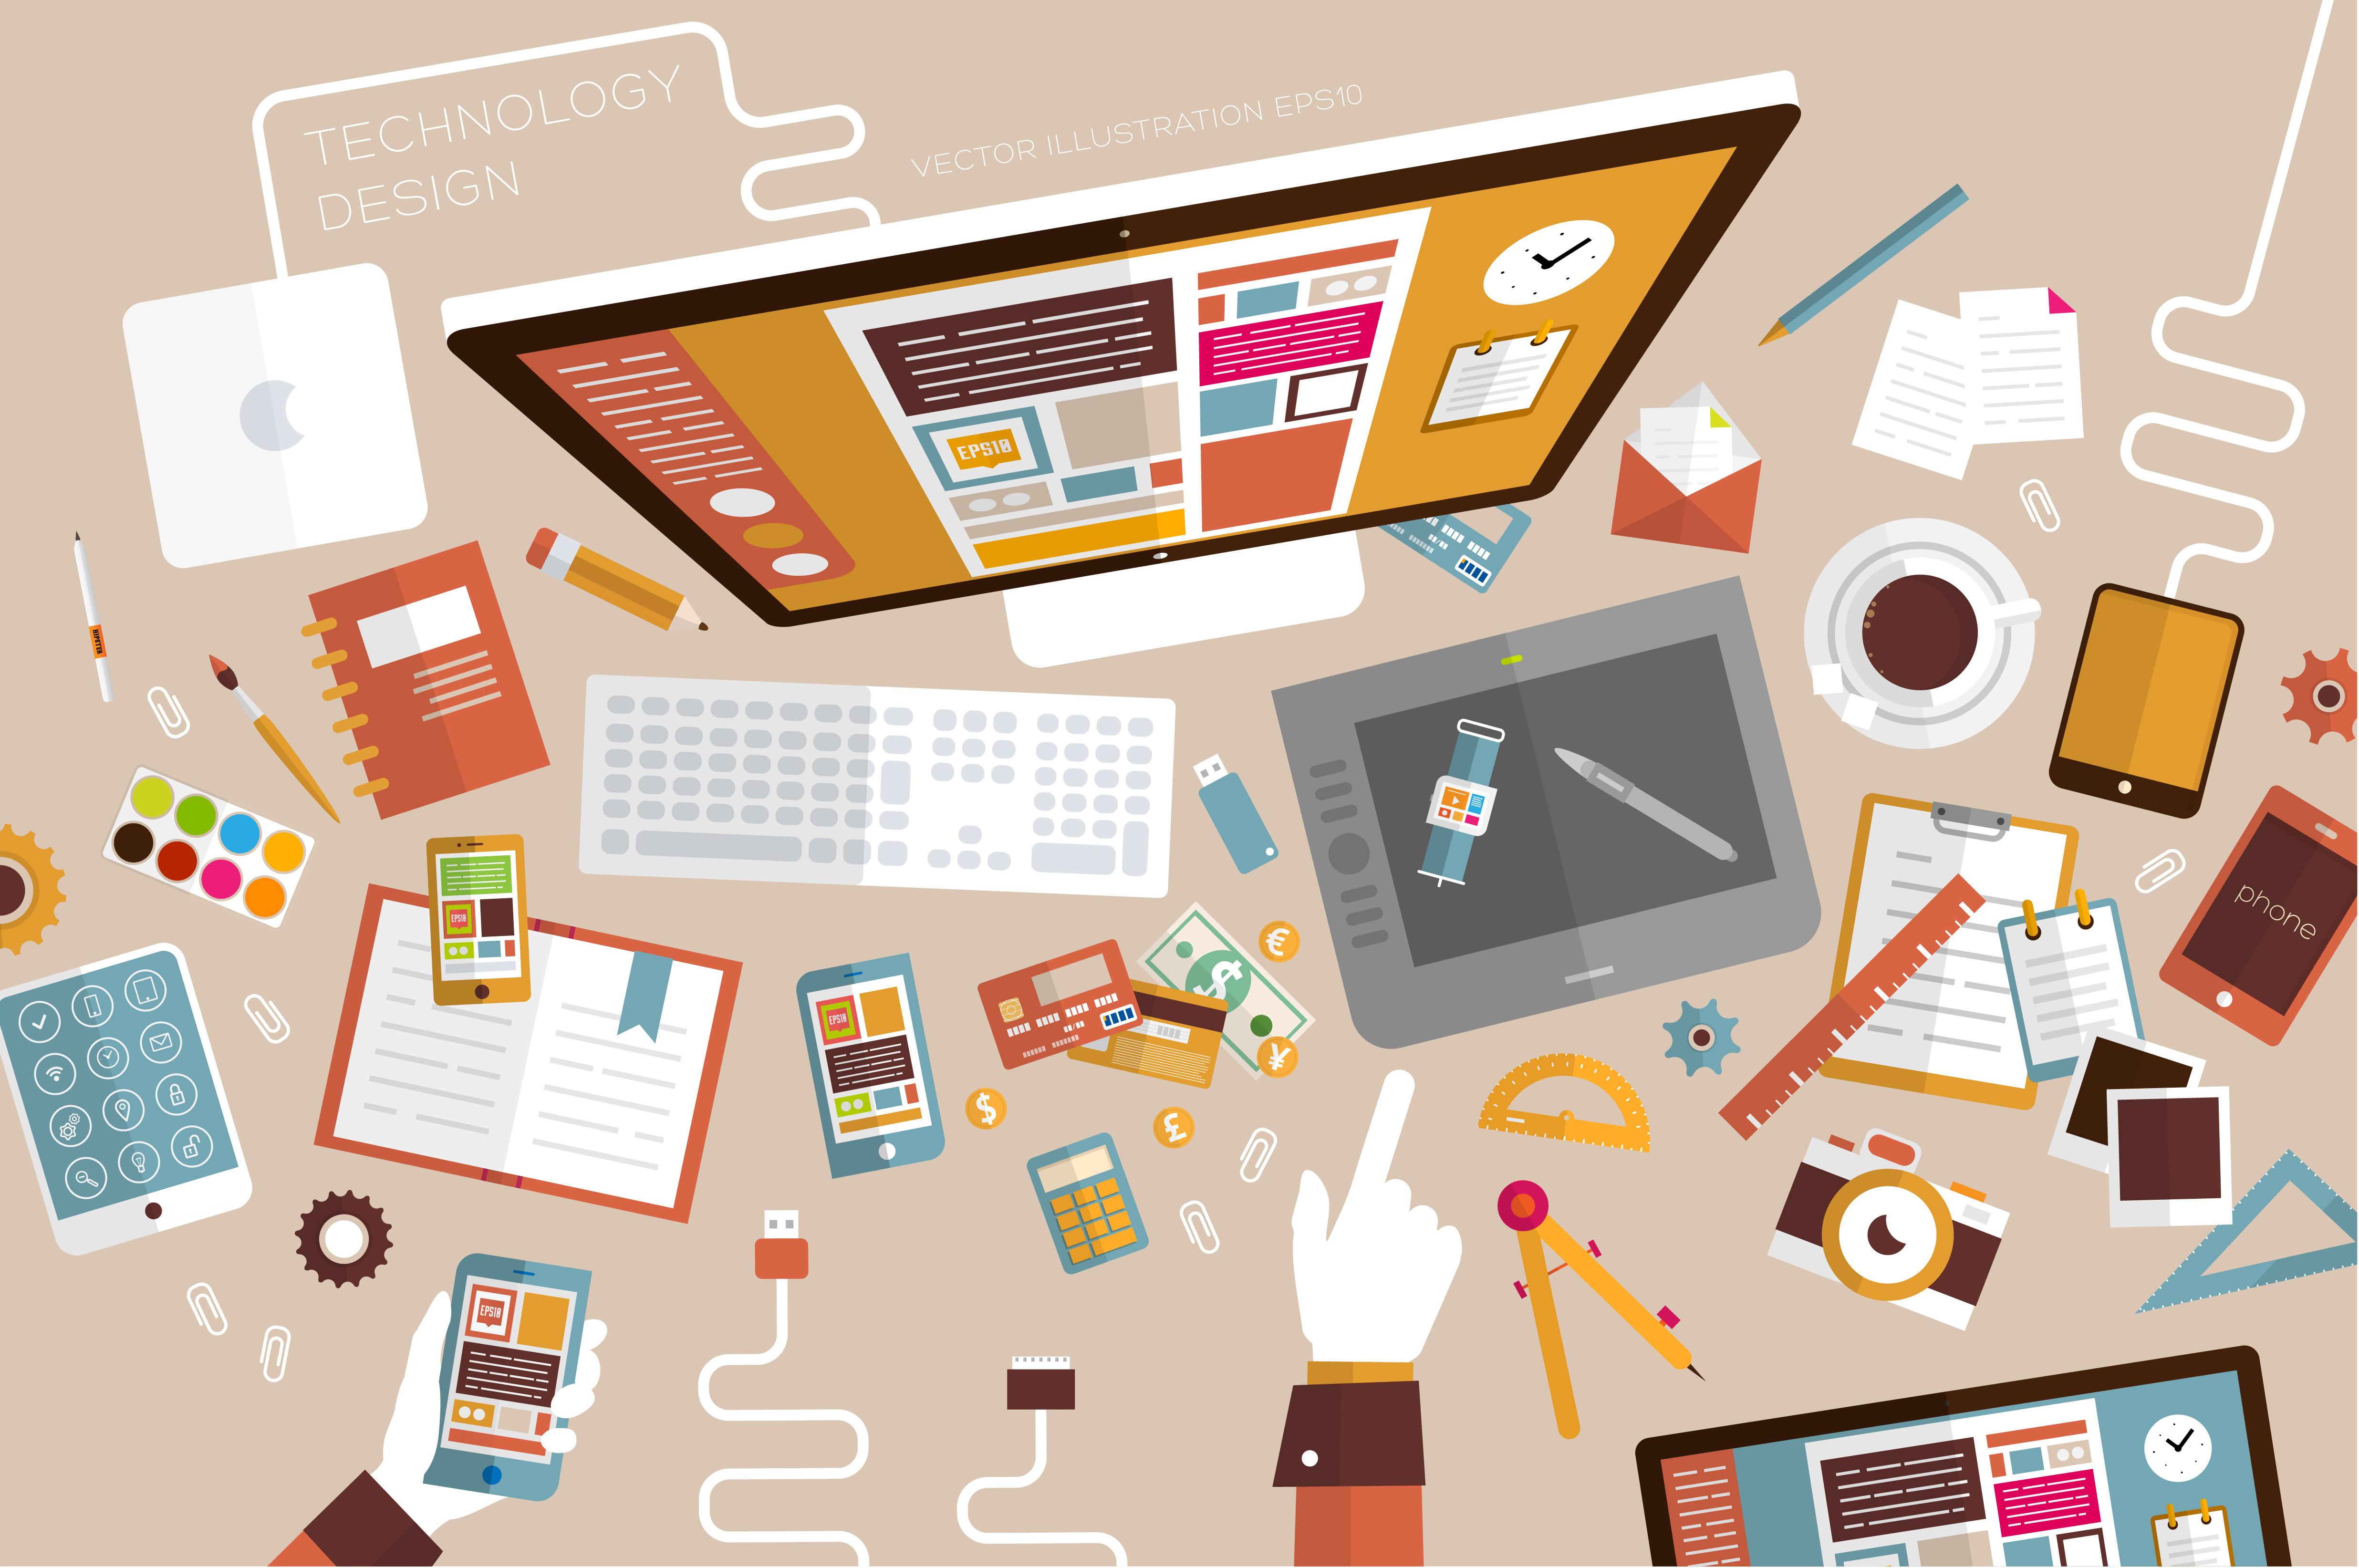 computers-laptops-digital